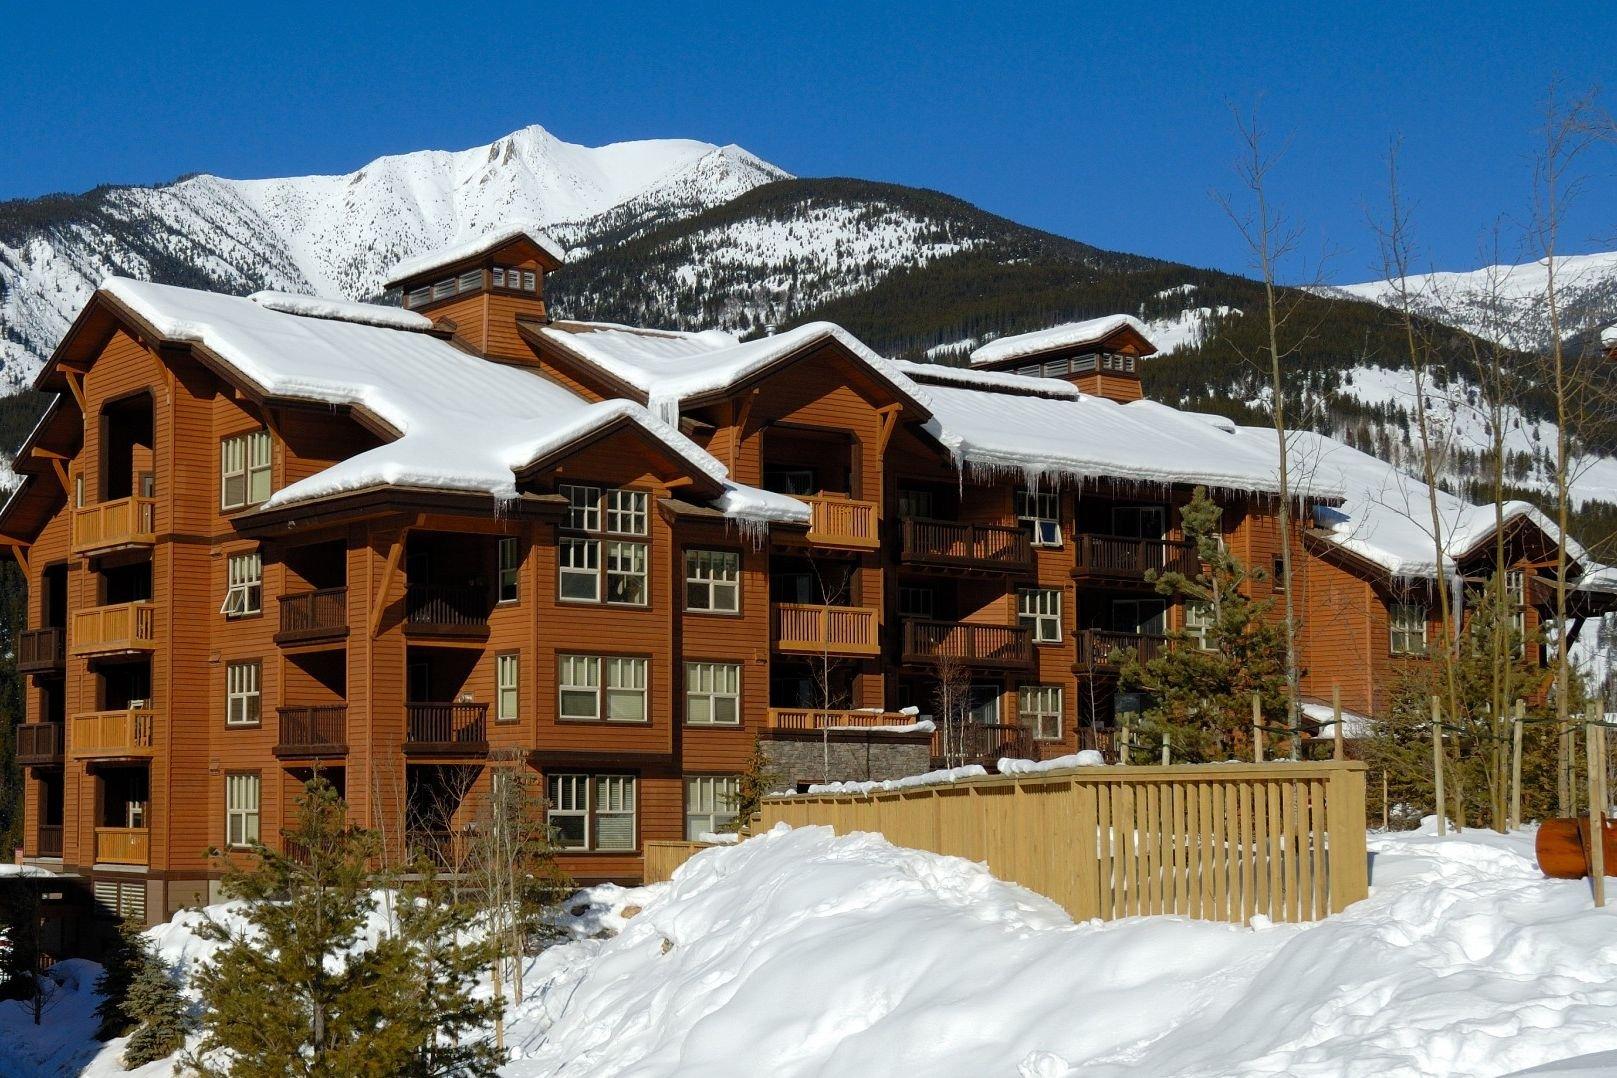 Panorama Mountain Village - 1000 peaks lodge exterior.jpg